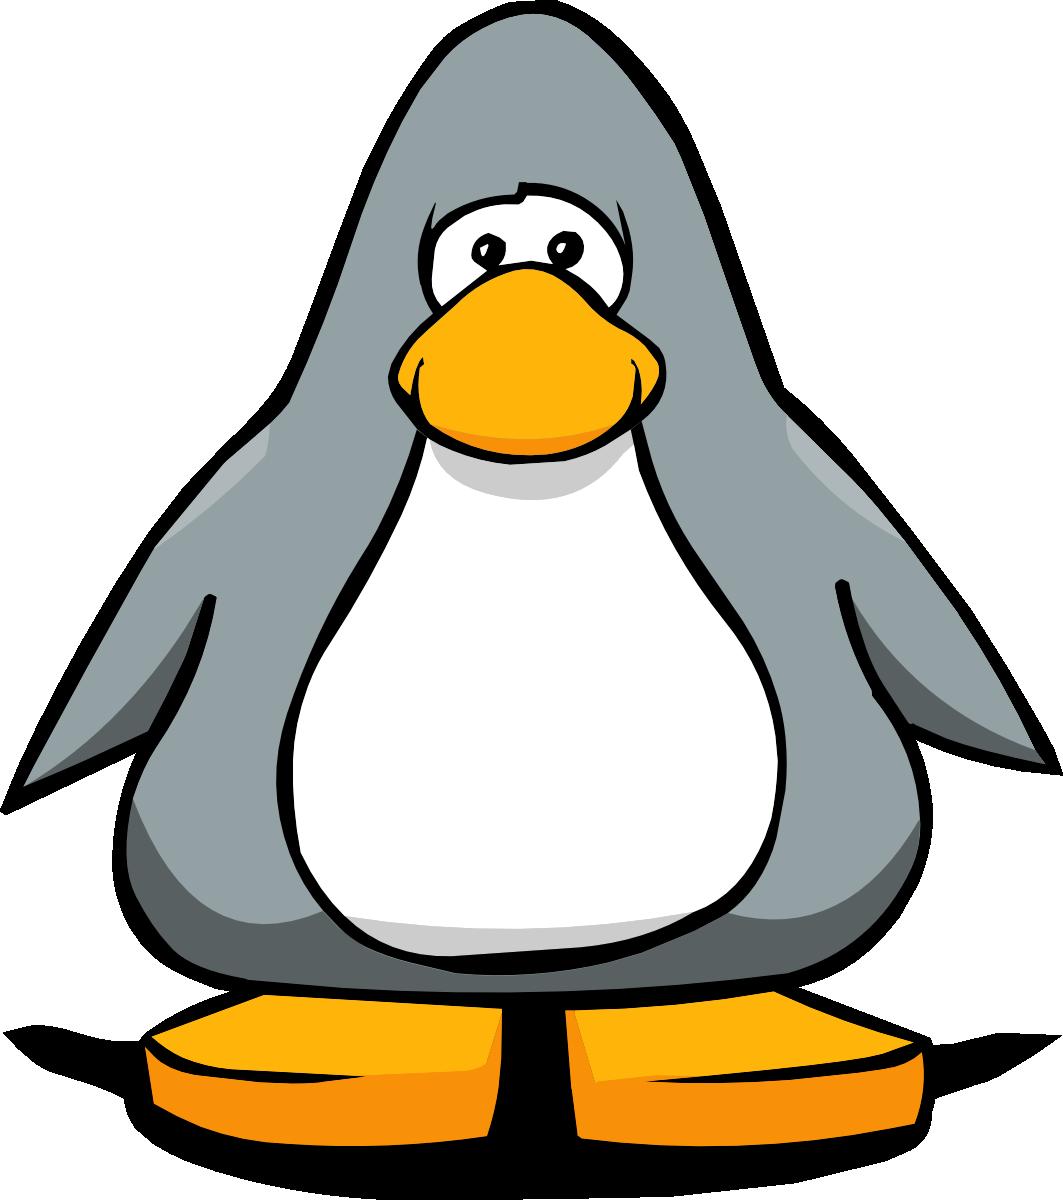 G Club Penguin Wiki Sensei Gray | Club Pen...